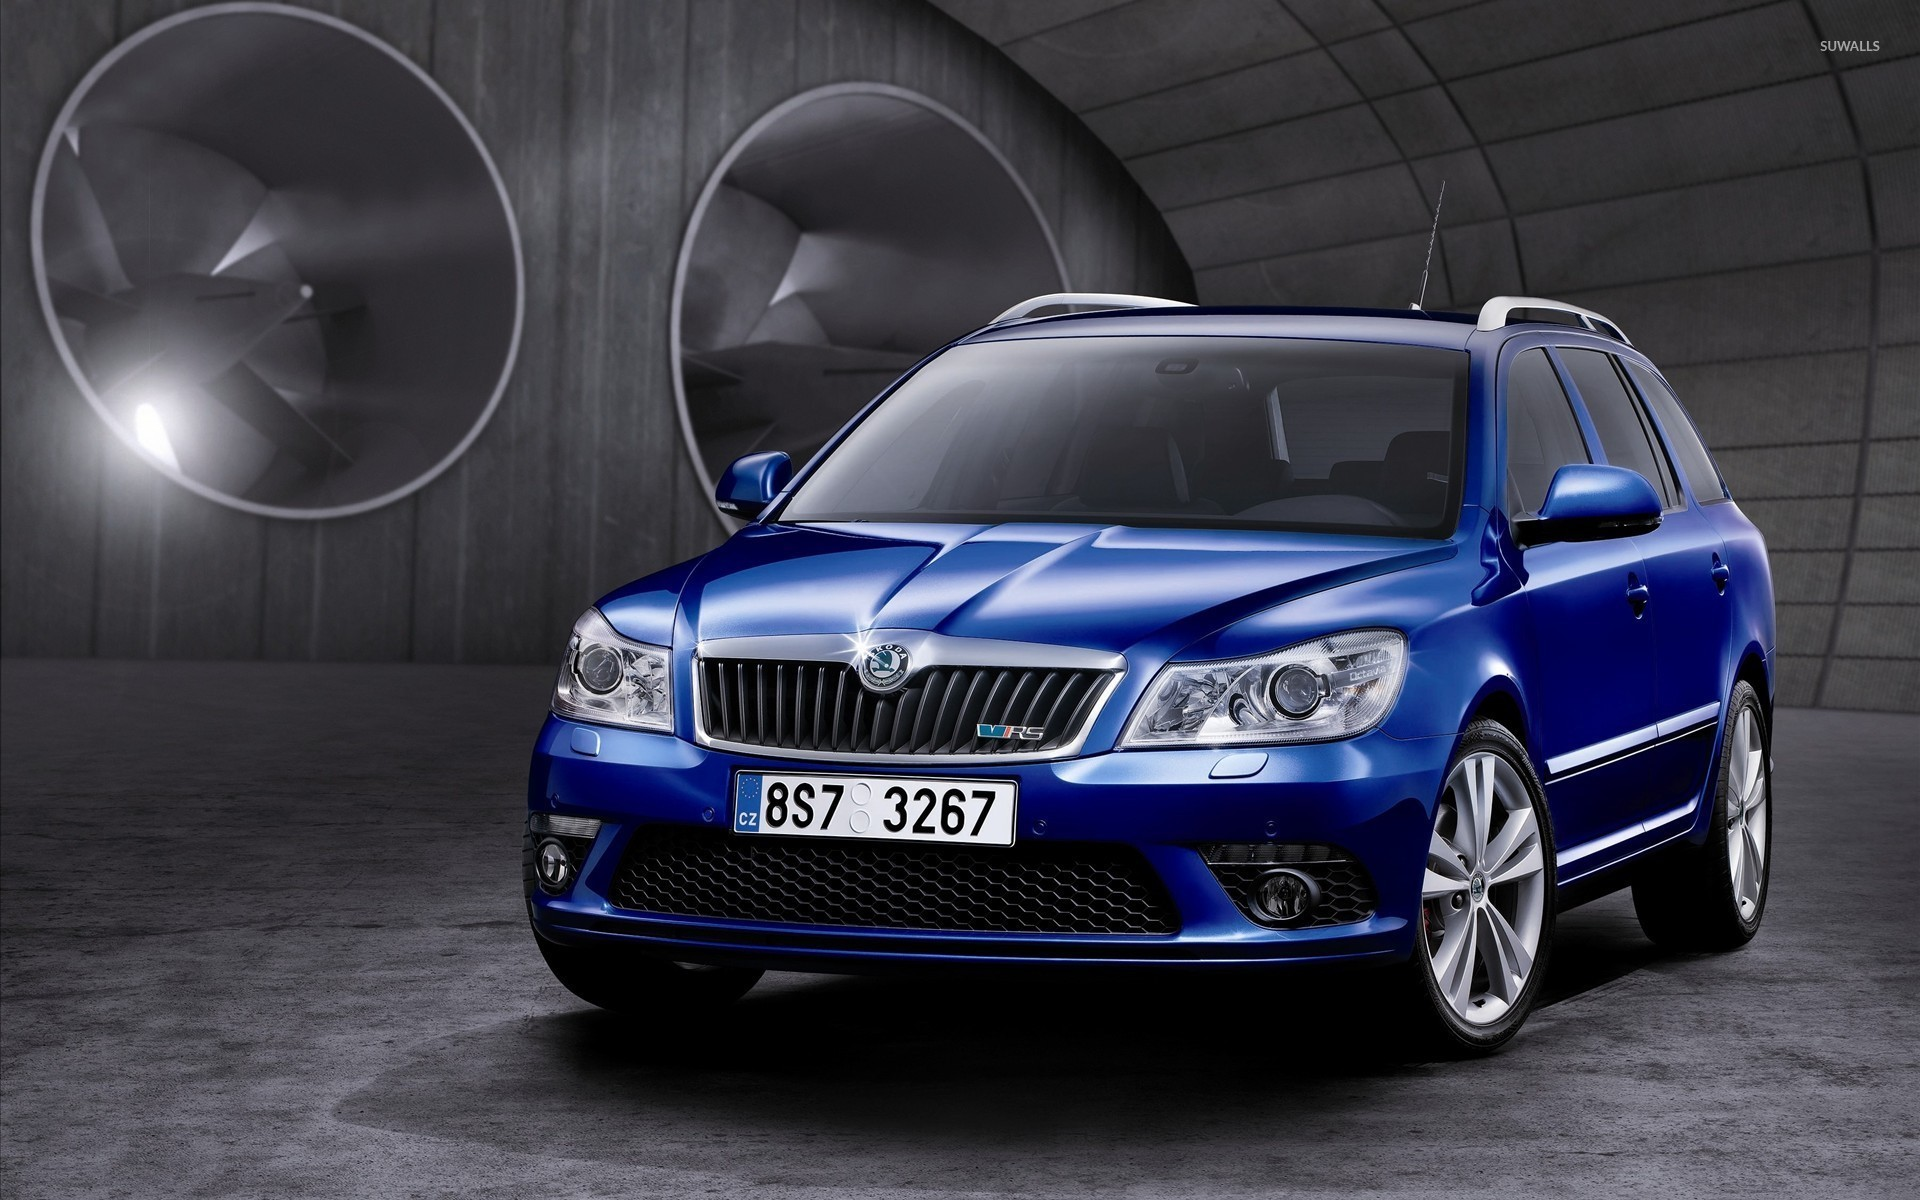 Blue Skoda Octavia Vrs Front Side View Wallpaper Car